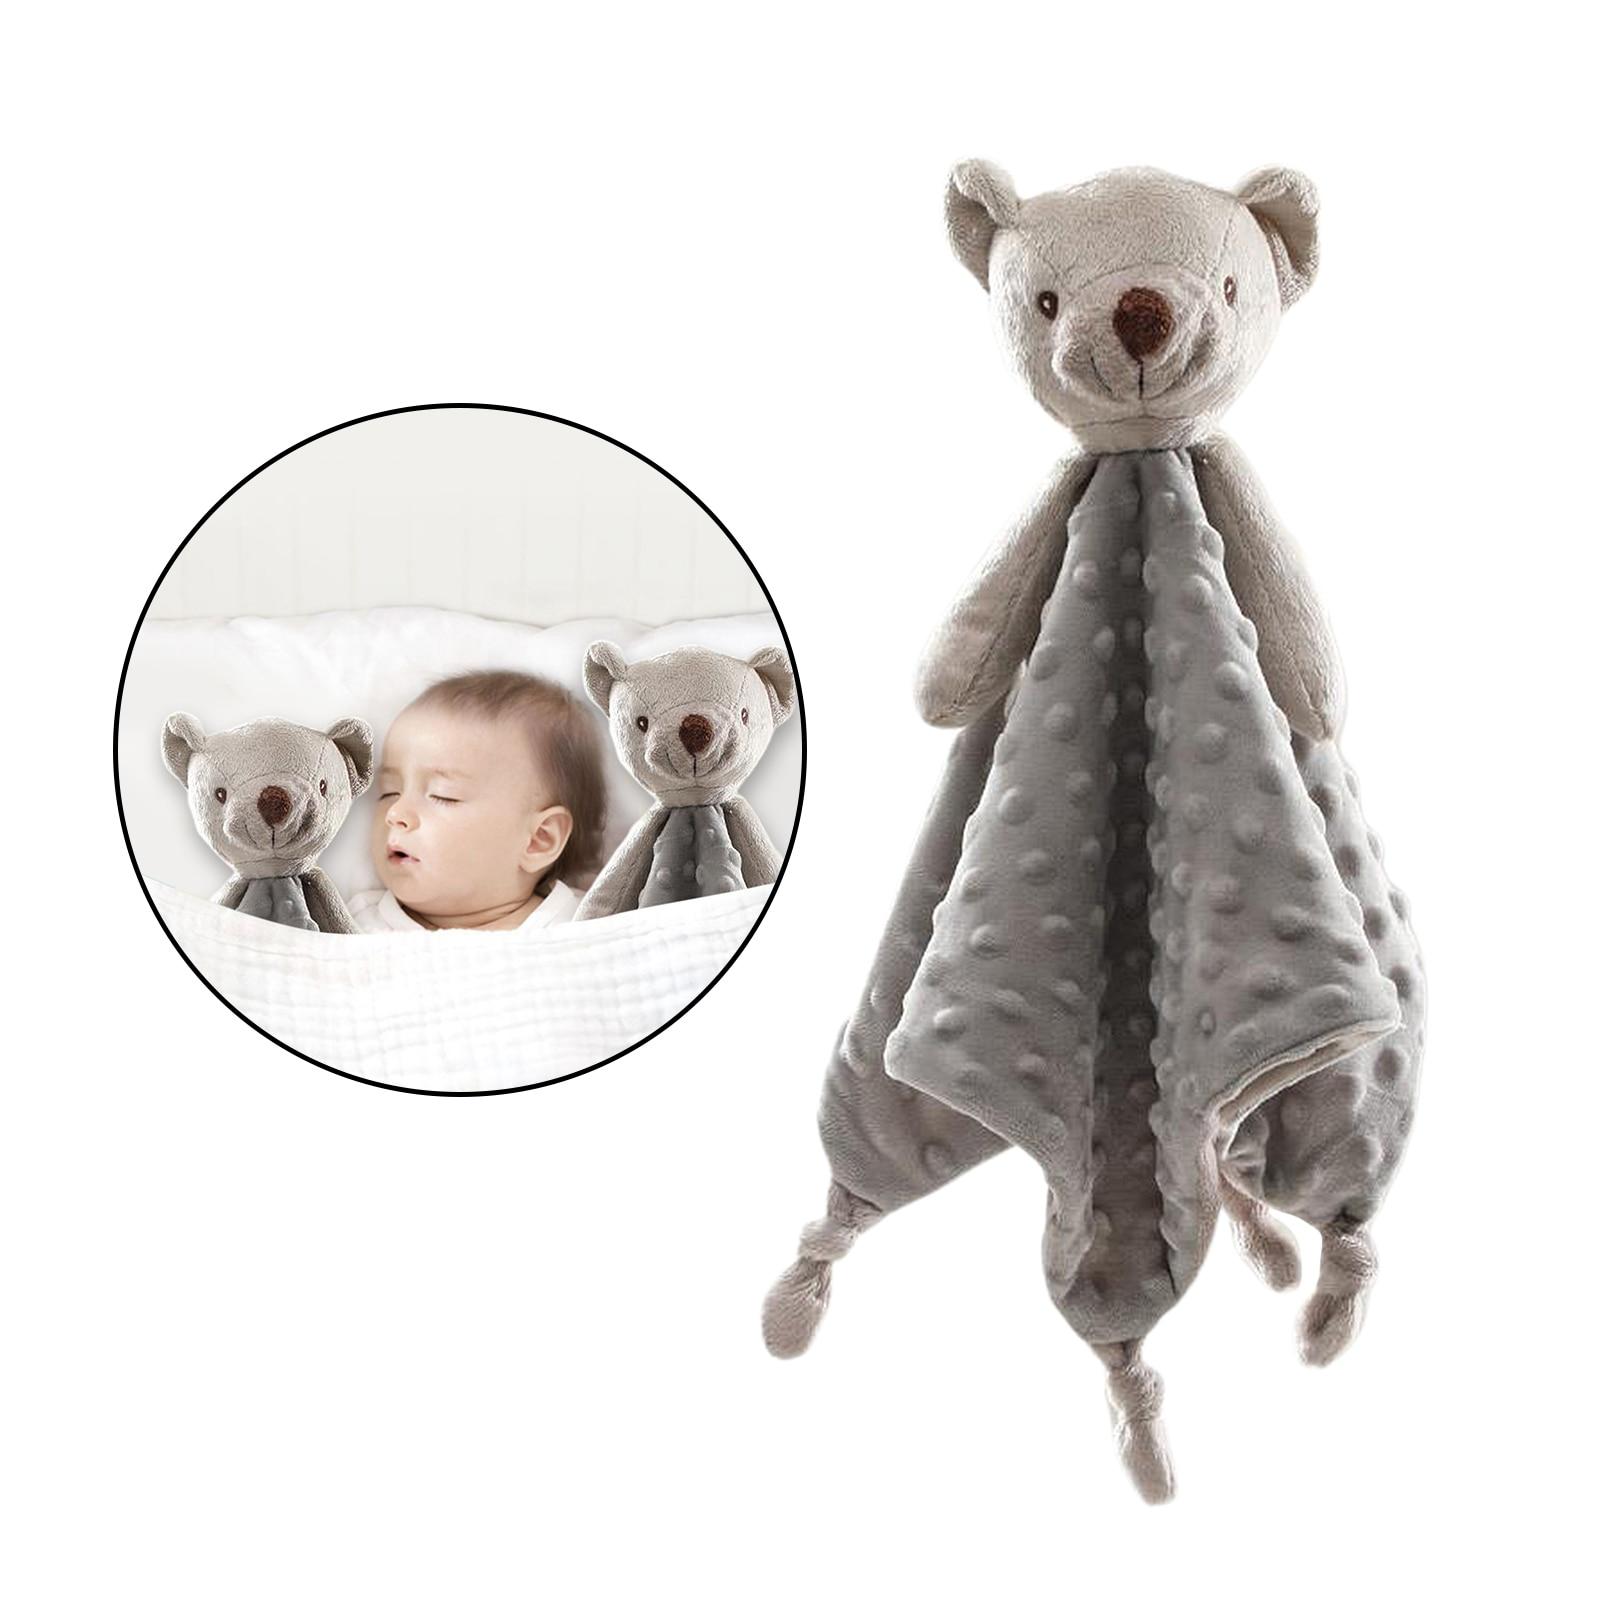 Baby Soothing Toys Security Blanket Baby Appease Saliva Towel Towel Baby Swing